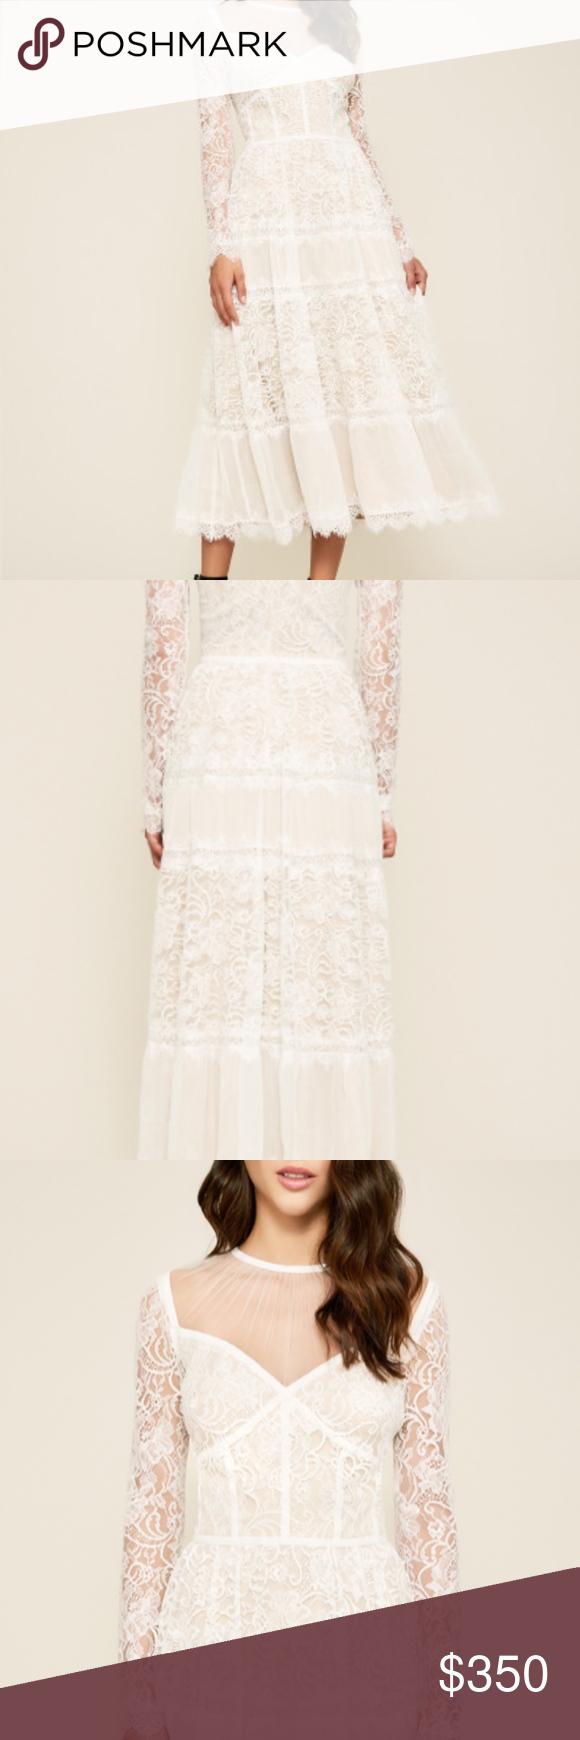 Tadashi Shoji Tatiana Long Sleeve White Lace Dress White Lace Long Sleeve Dress Lace White Dress Lace Dress [ 1740 x 580 Pixel ]